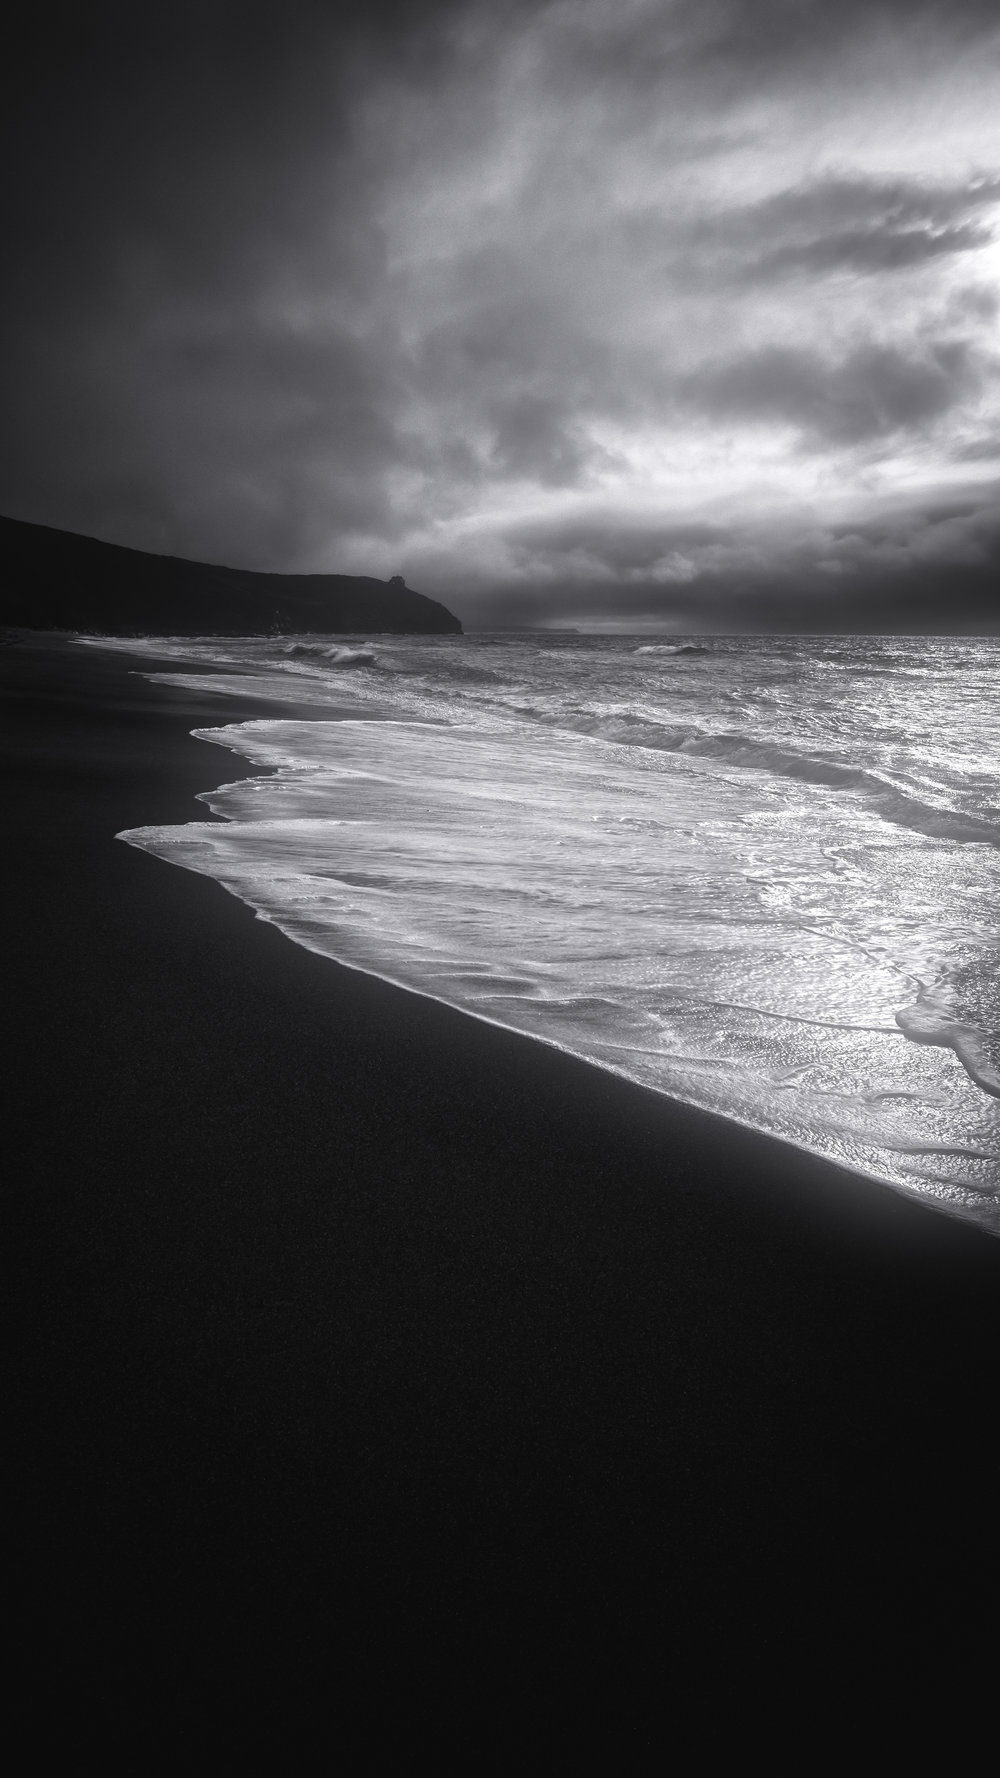 Praa sand high contrast beach 16 by 9 orton final darker skycopyright.jpg